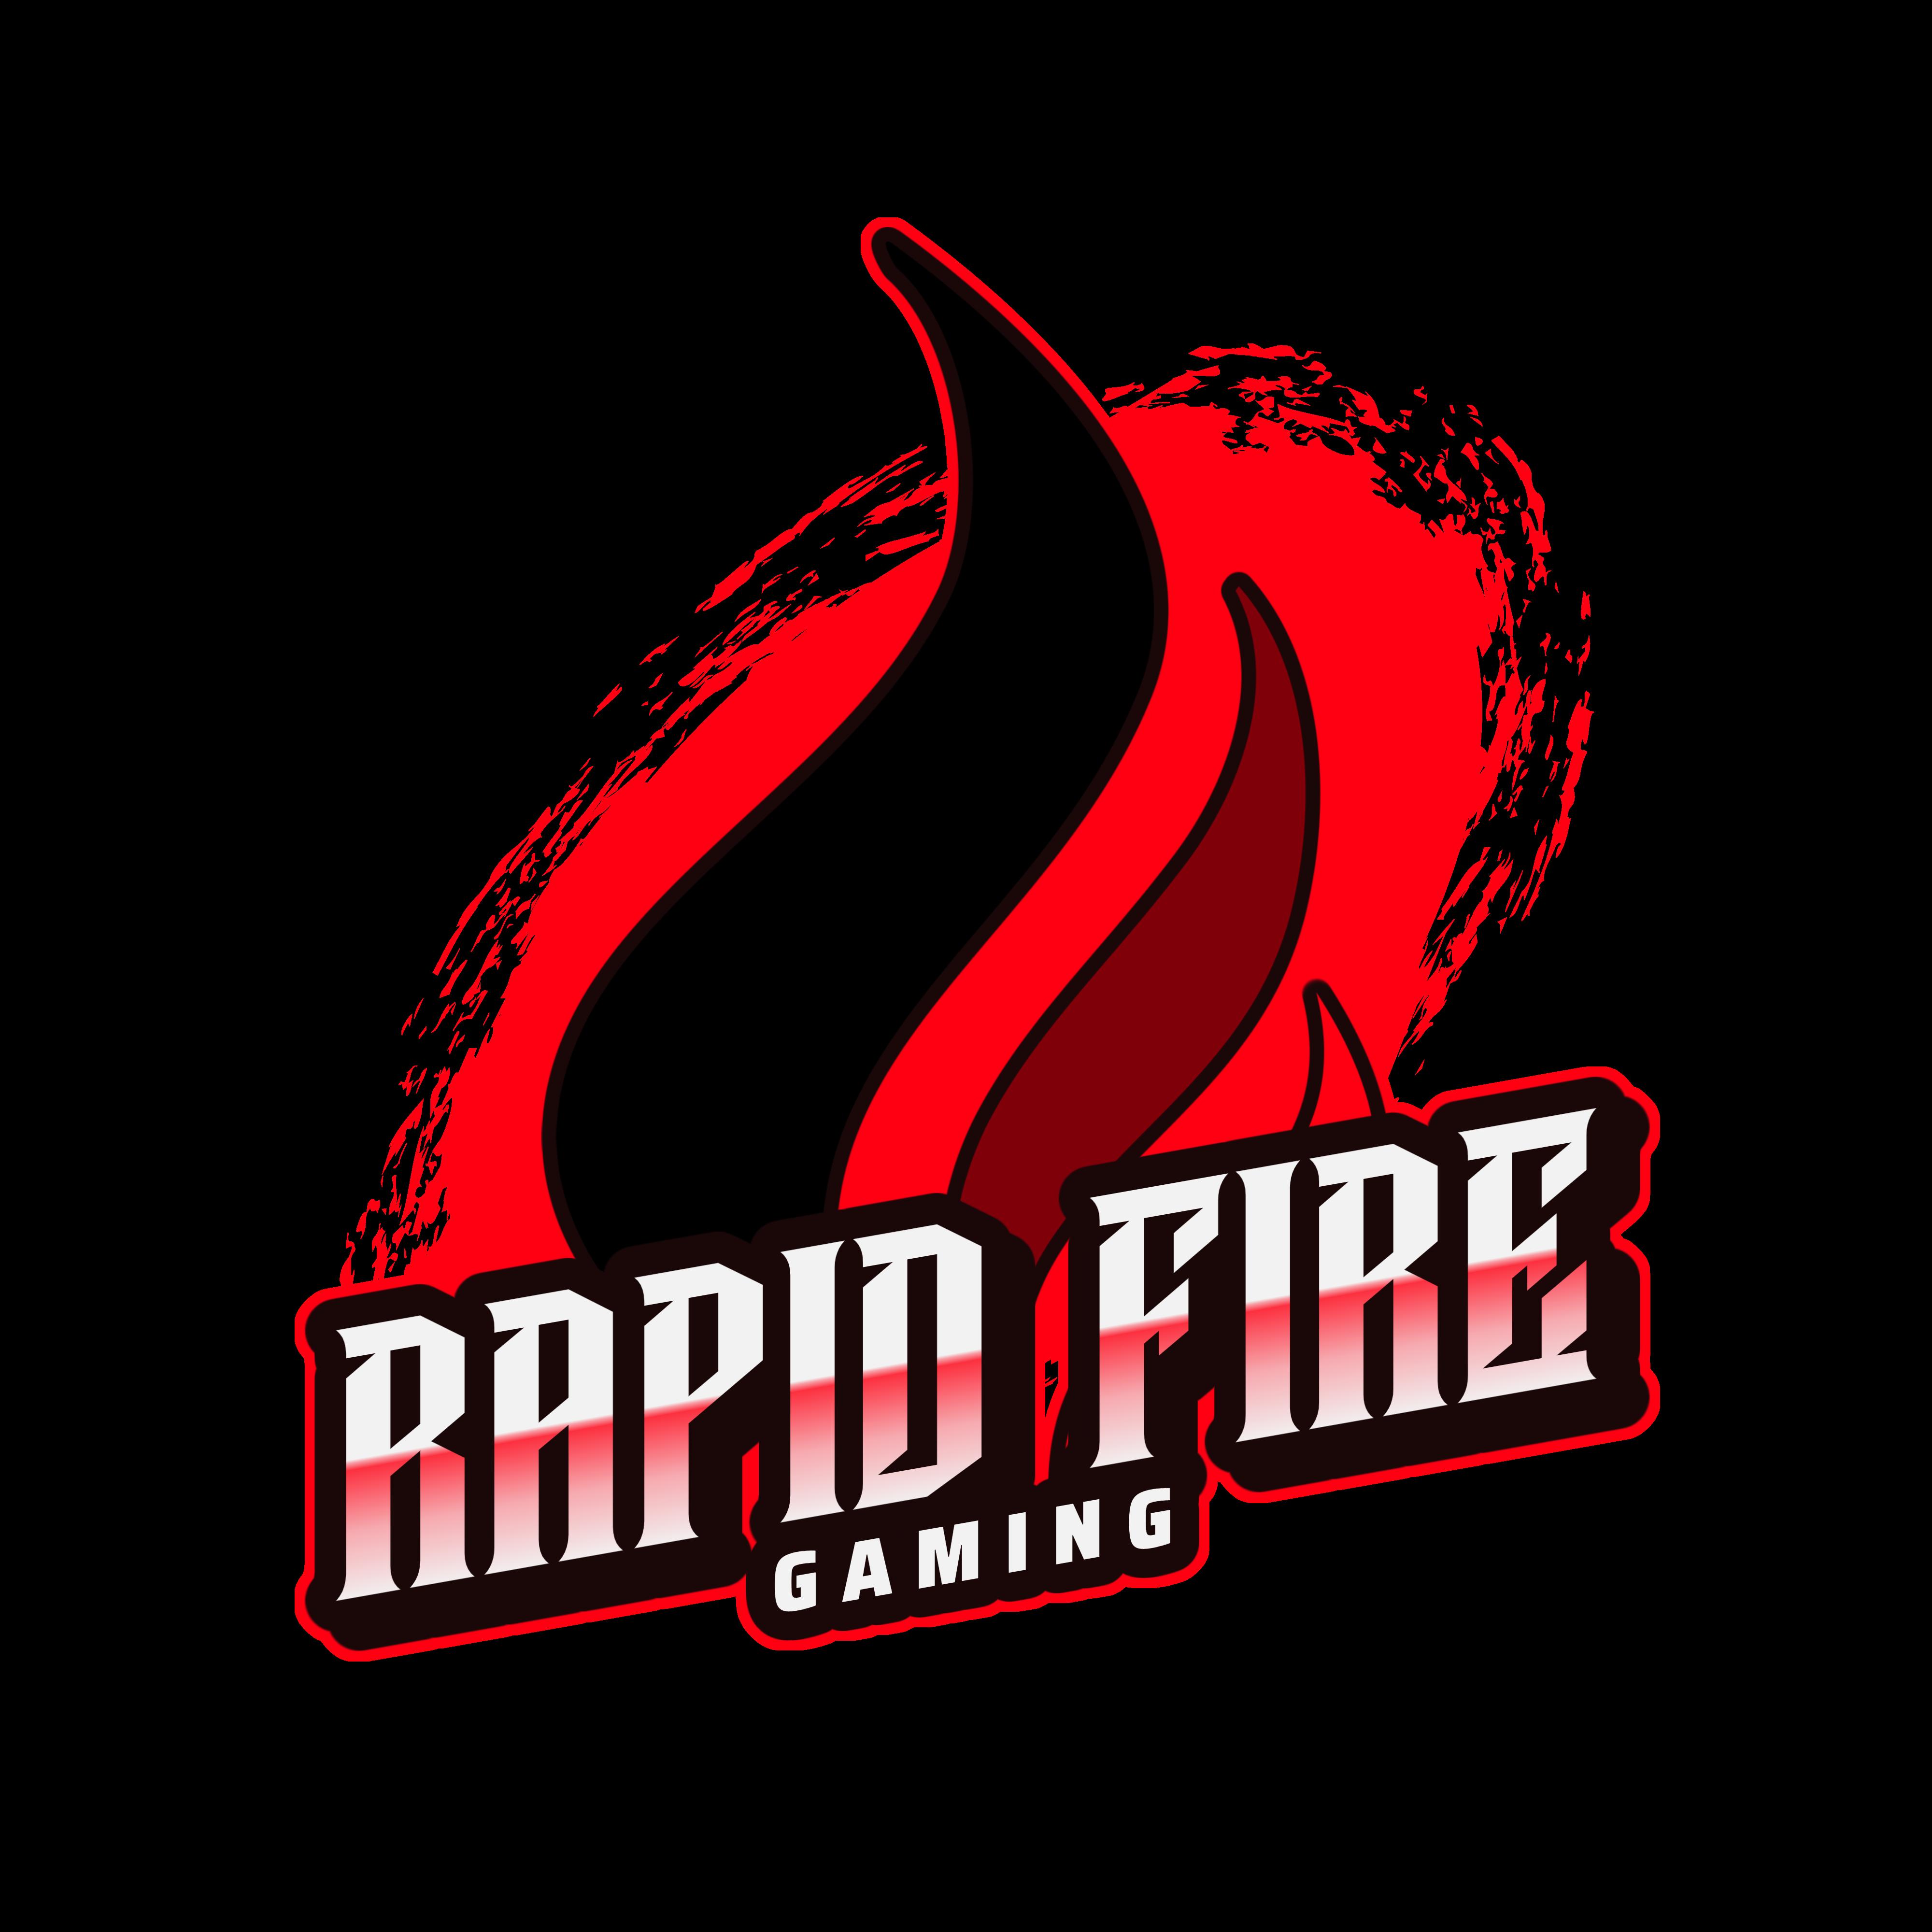 Rapid Fire Test designs